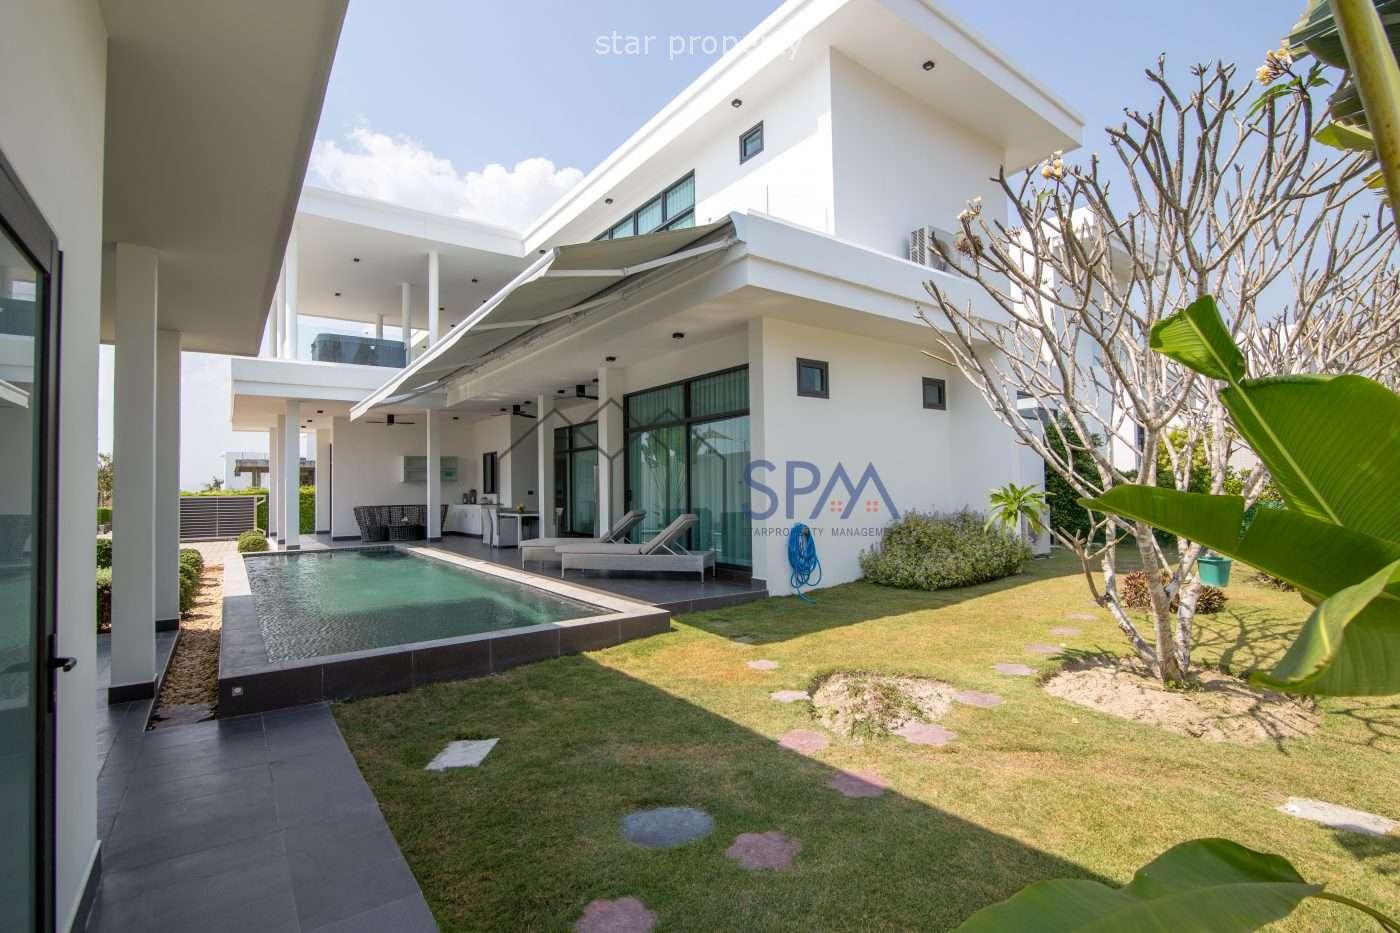 Pool Villa resort style for sale at La Lua Resort